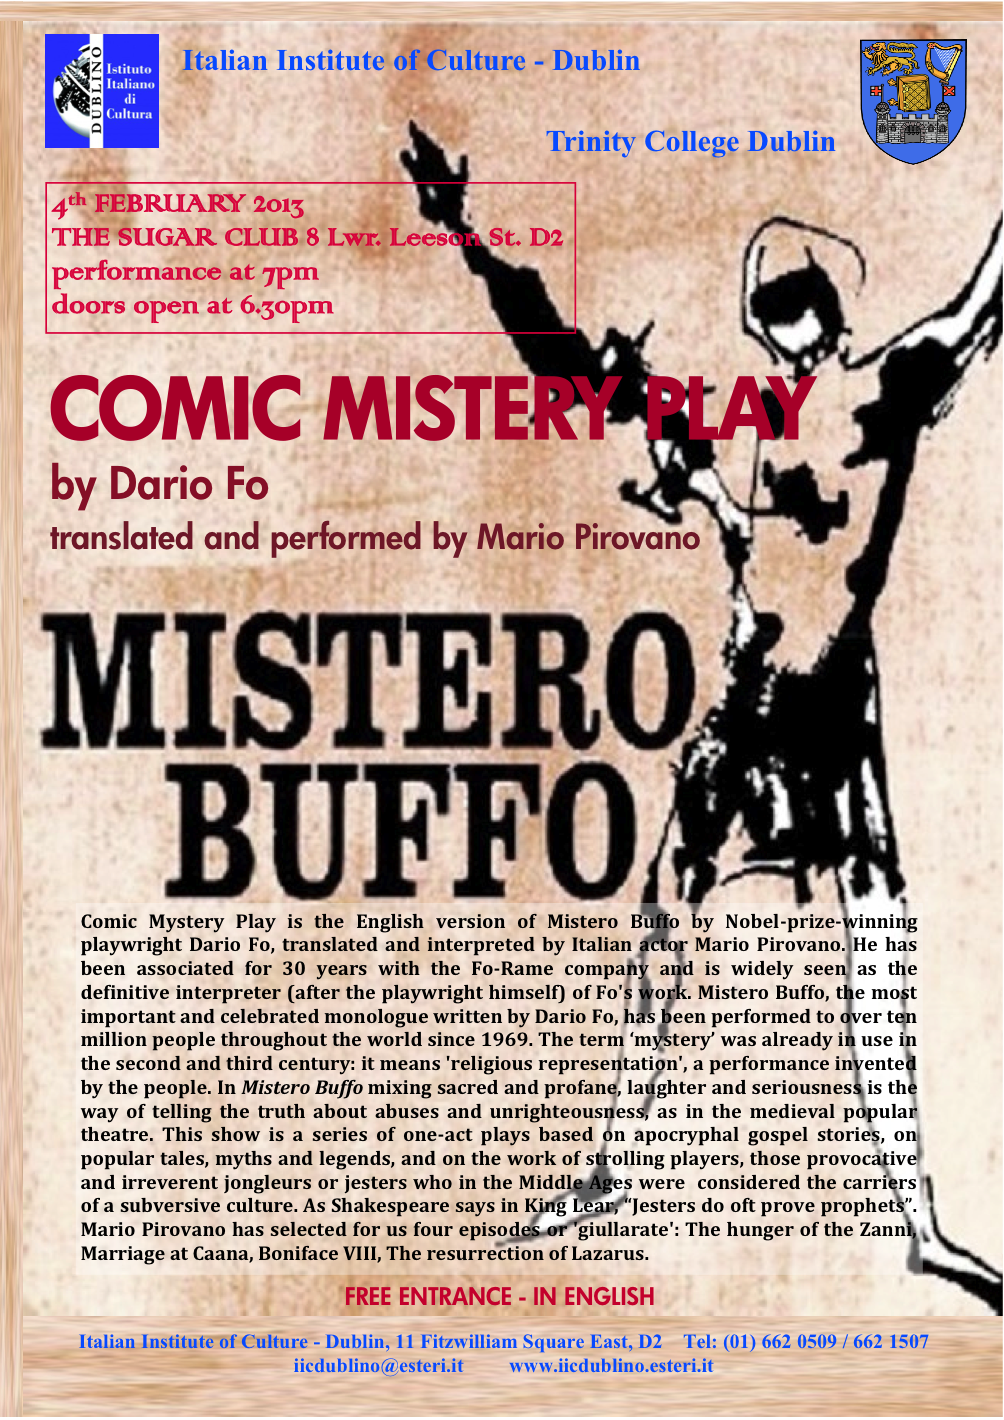 Comic Mistery Play